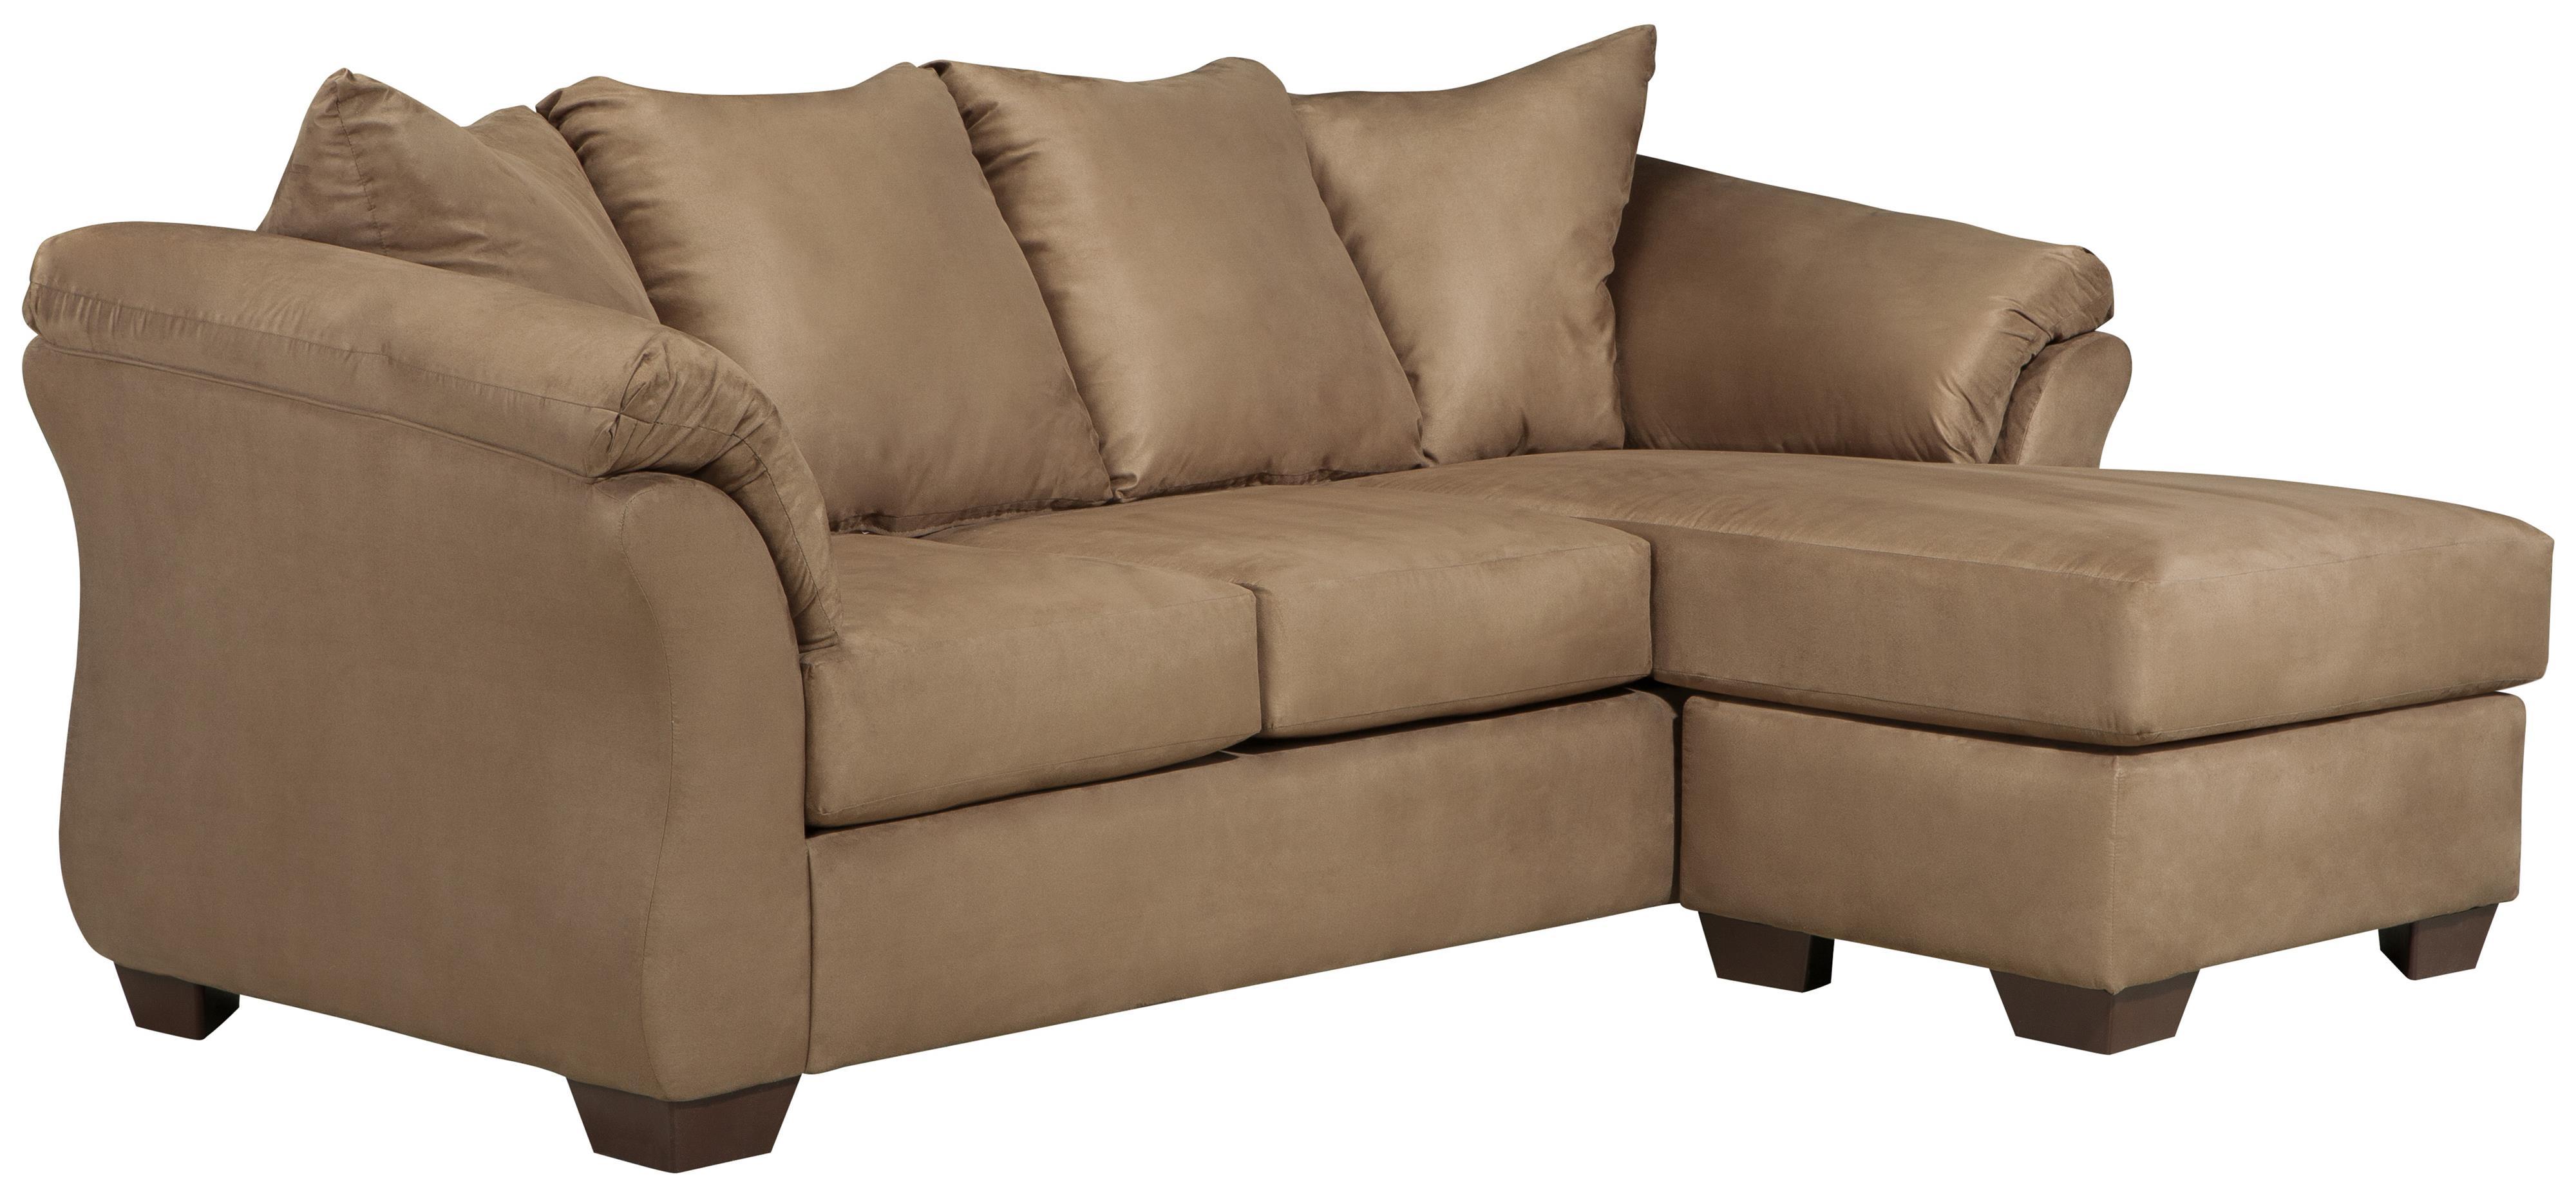 Signature design by ashley darcy mocha contemporary sofa for Chaises design colorees